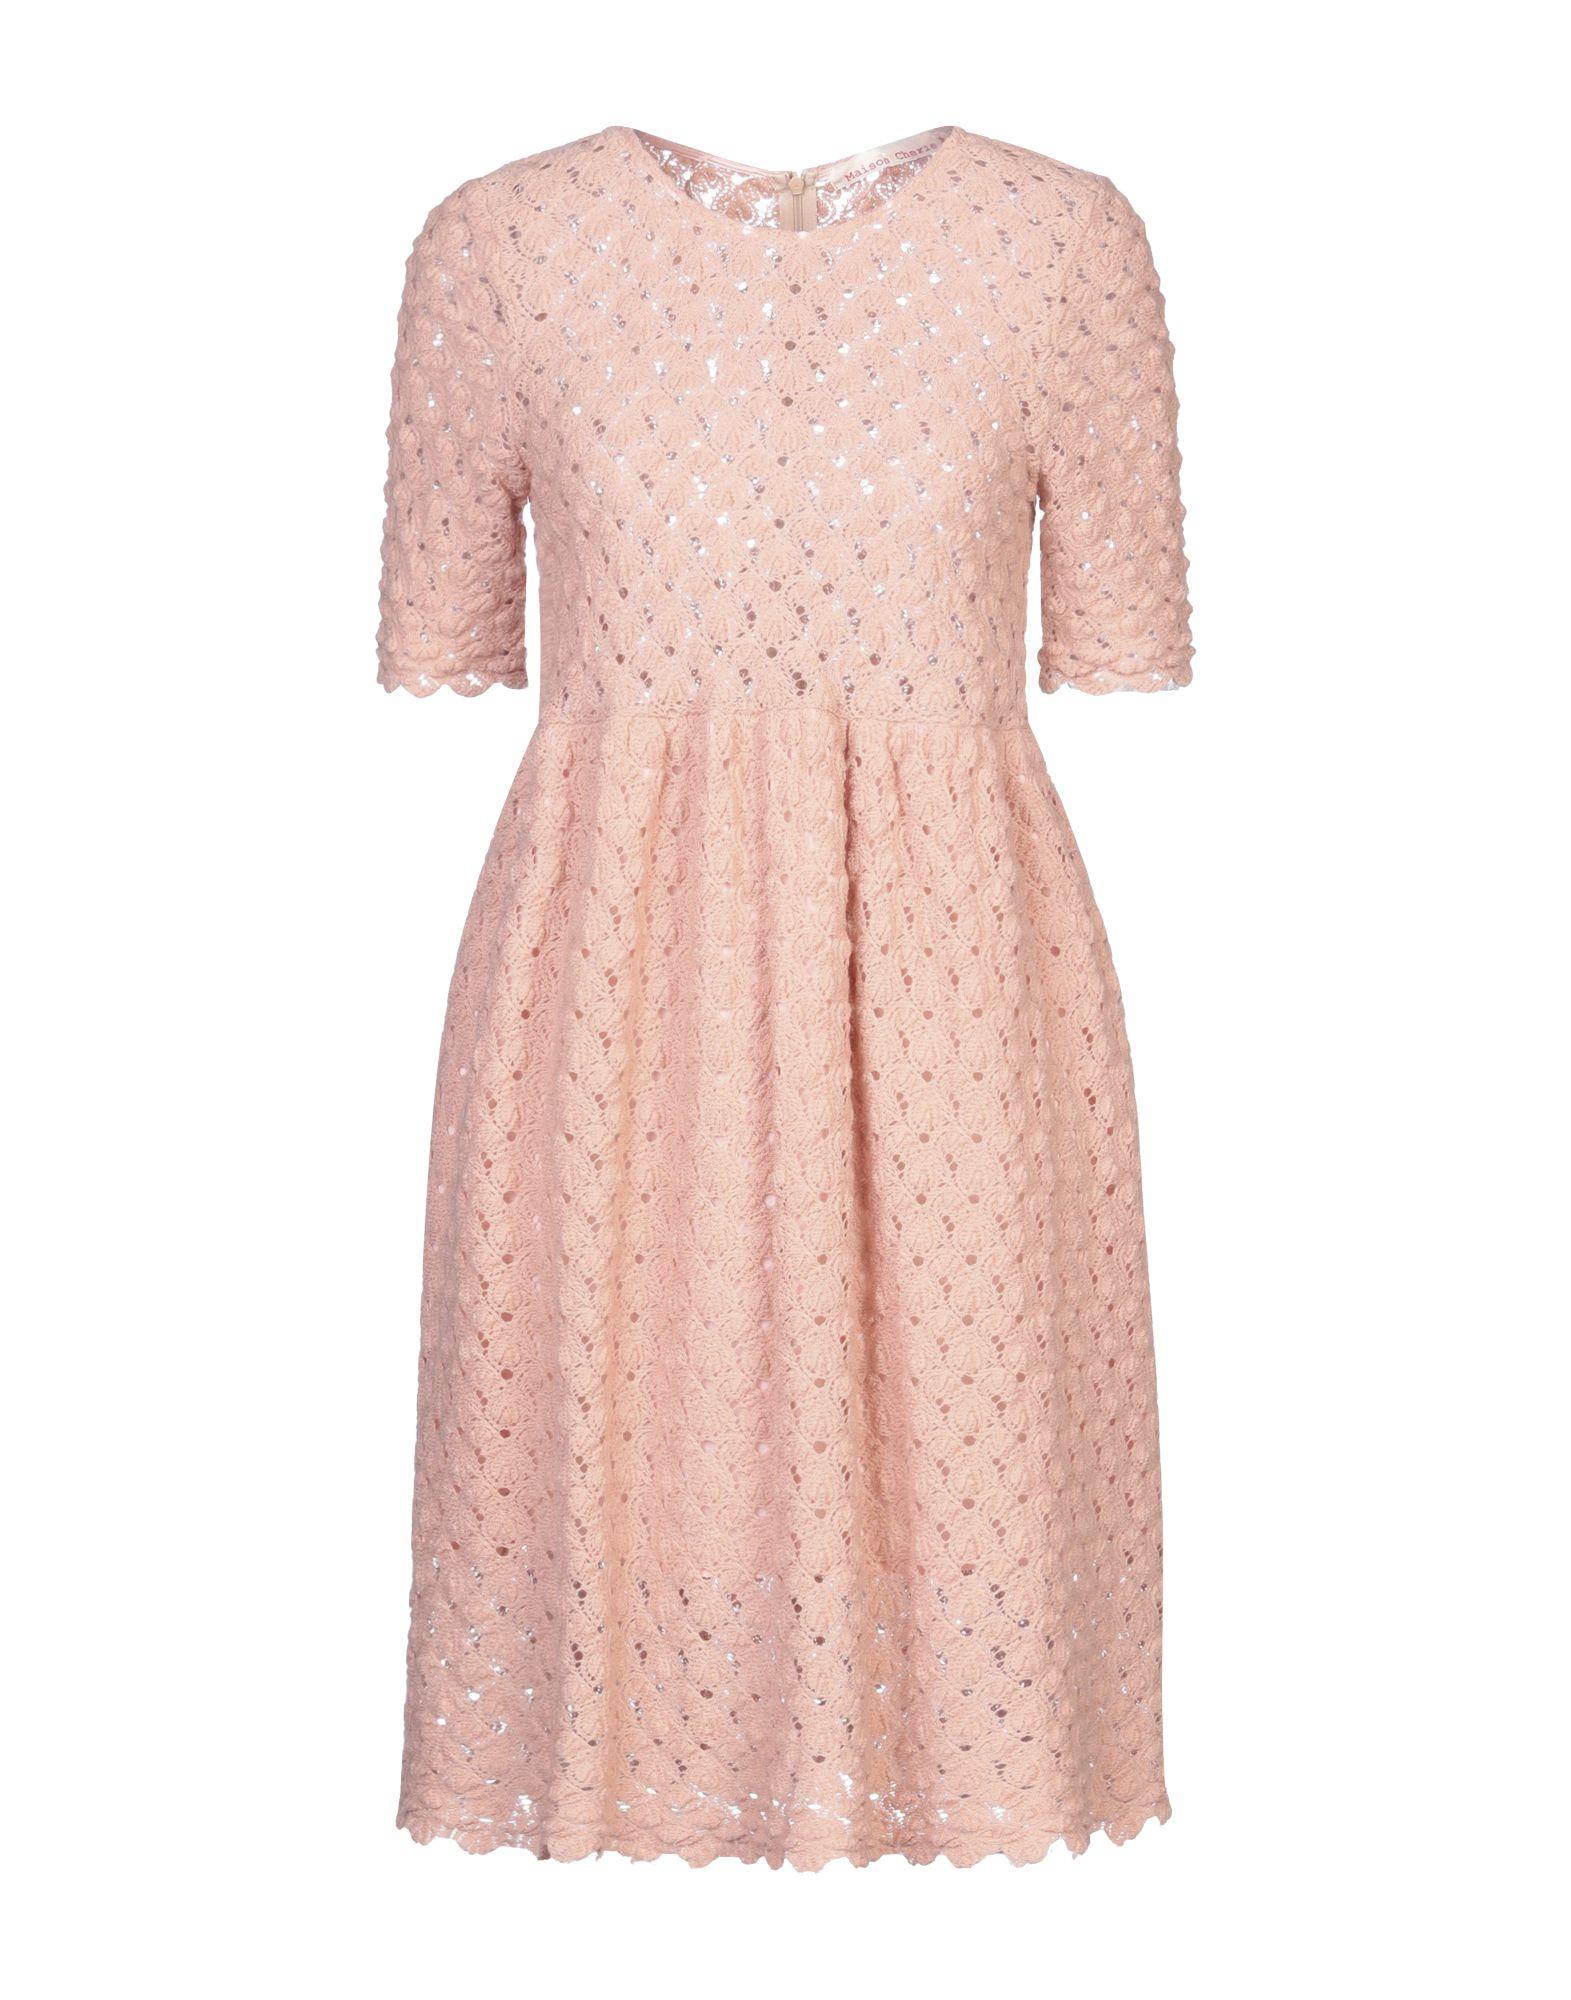 MAISON CHERIE Короткое платье